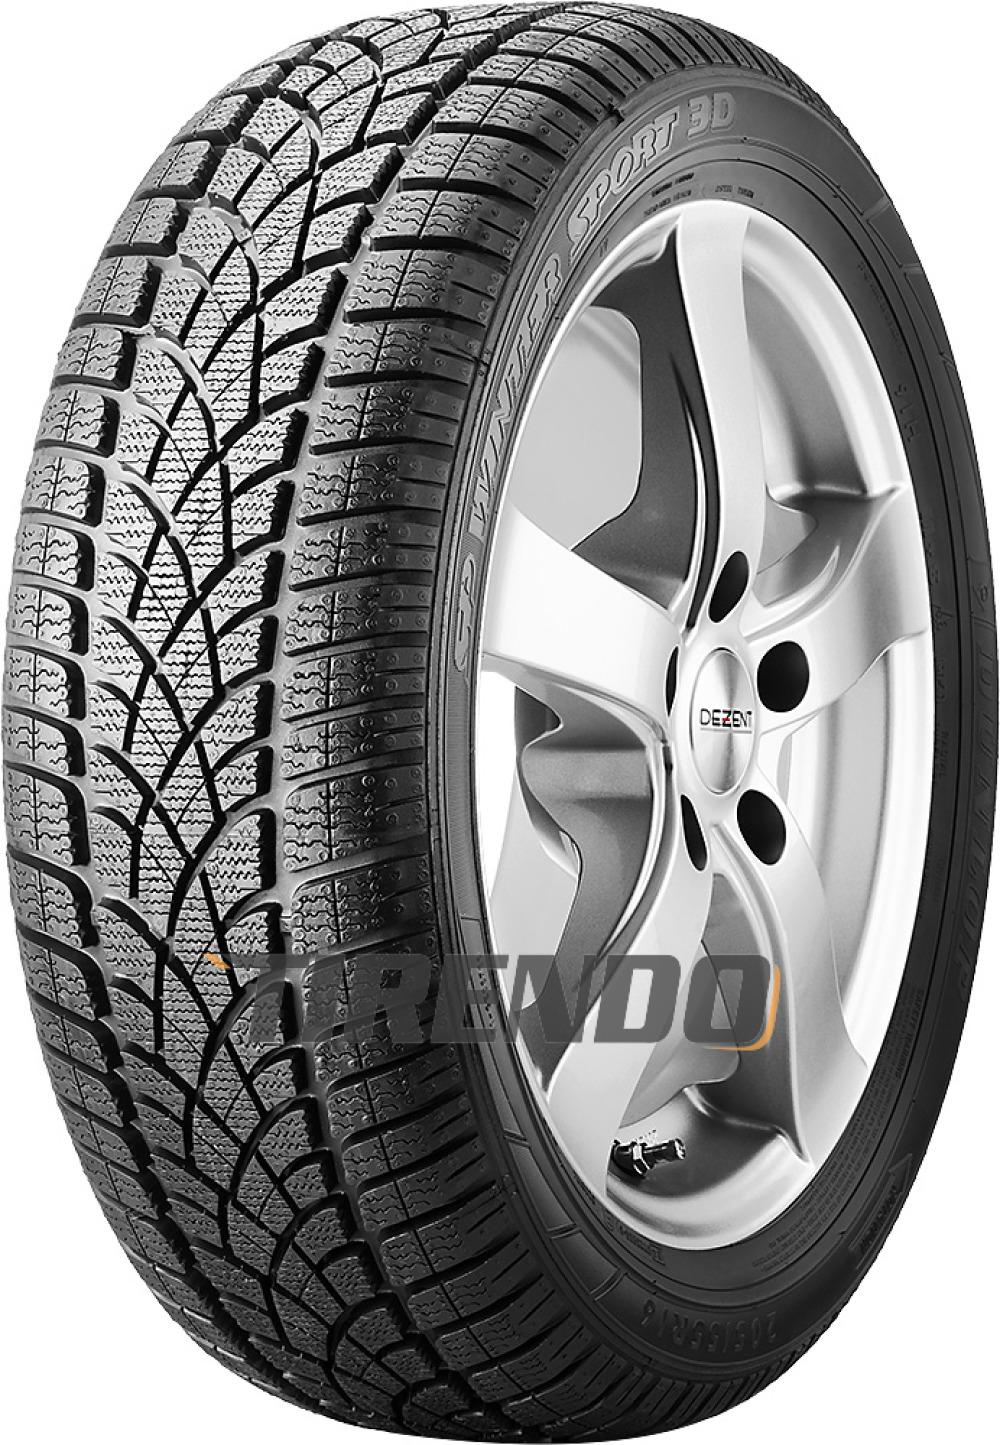 Dunlop SP Winter Sport 3D ( 255/40 R19 100V XL mit Felgenschutz (MFS), RO1 )